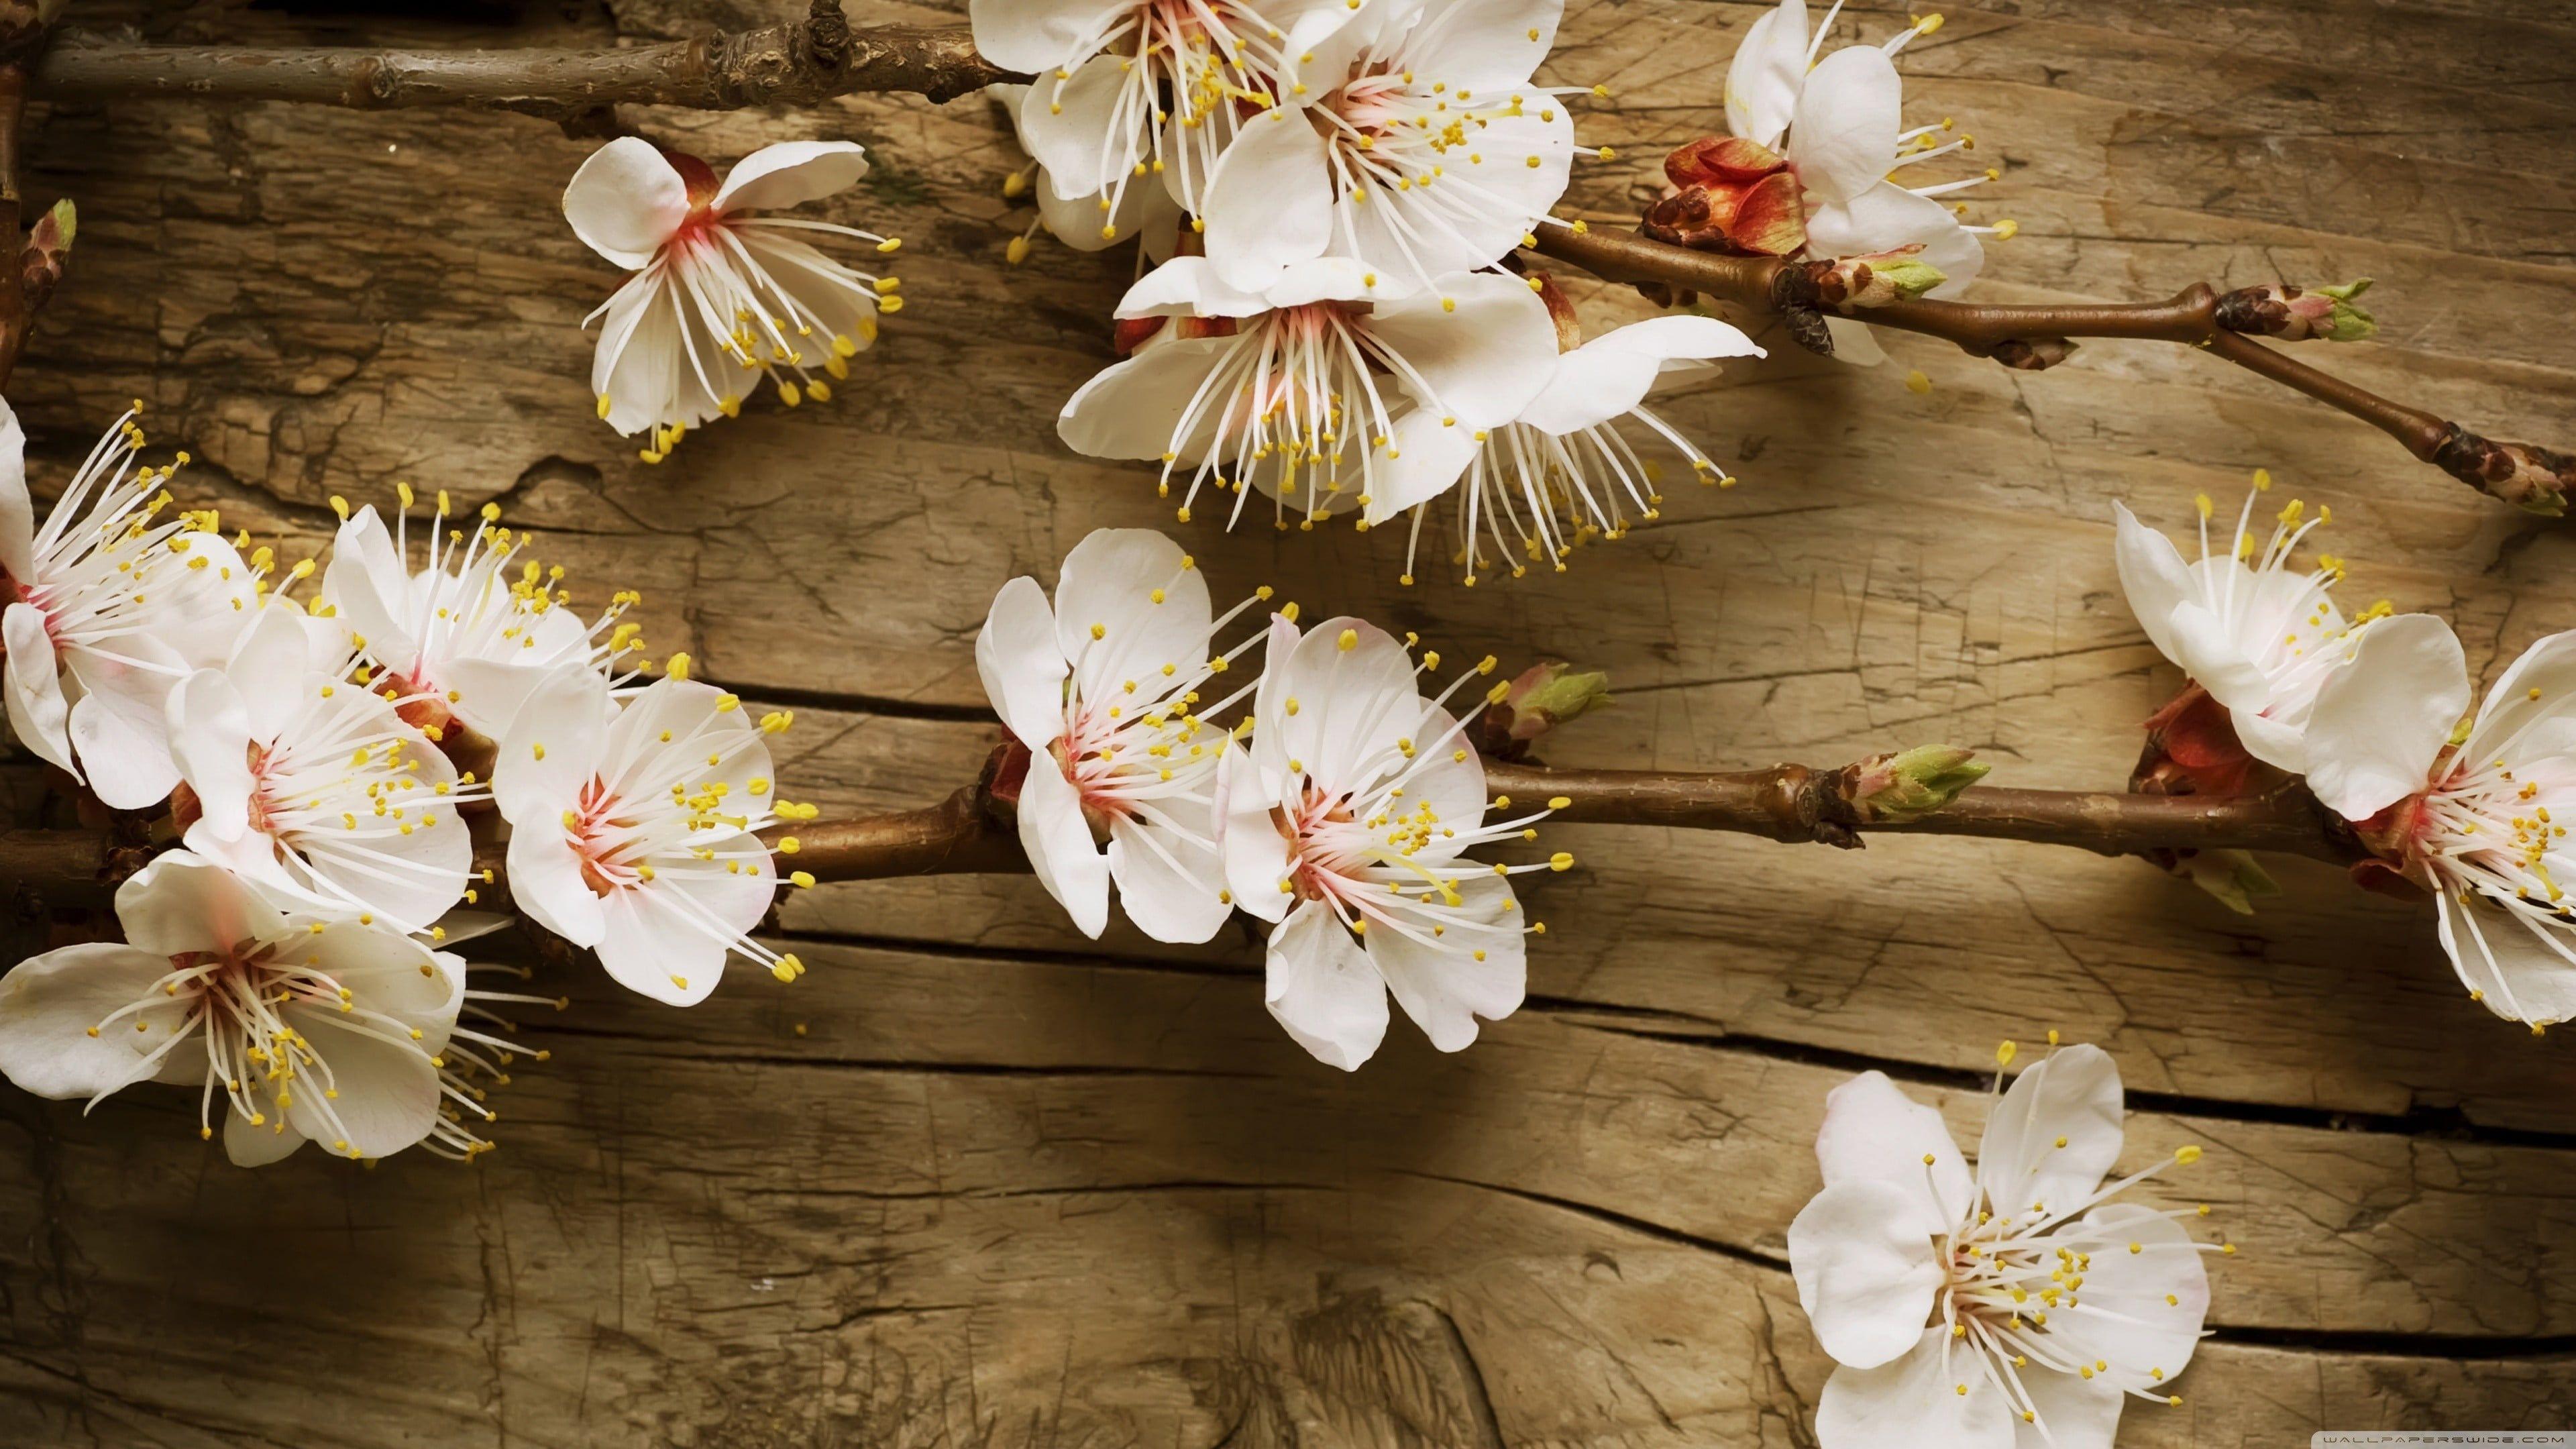 nature flowers plants 4K wallpaper hdwallpaper